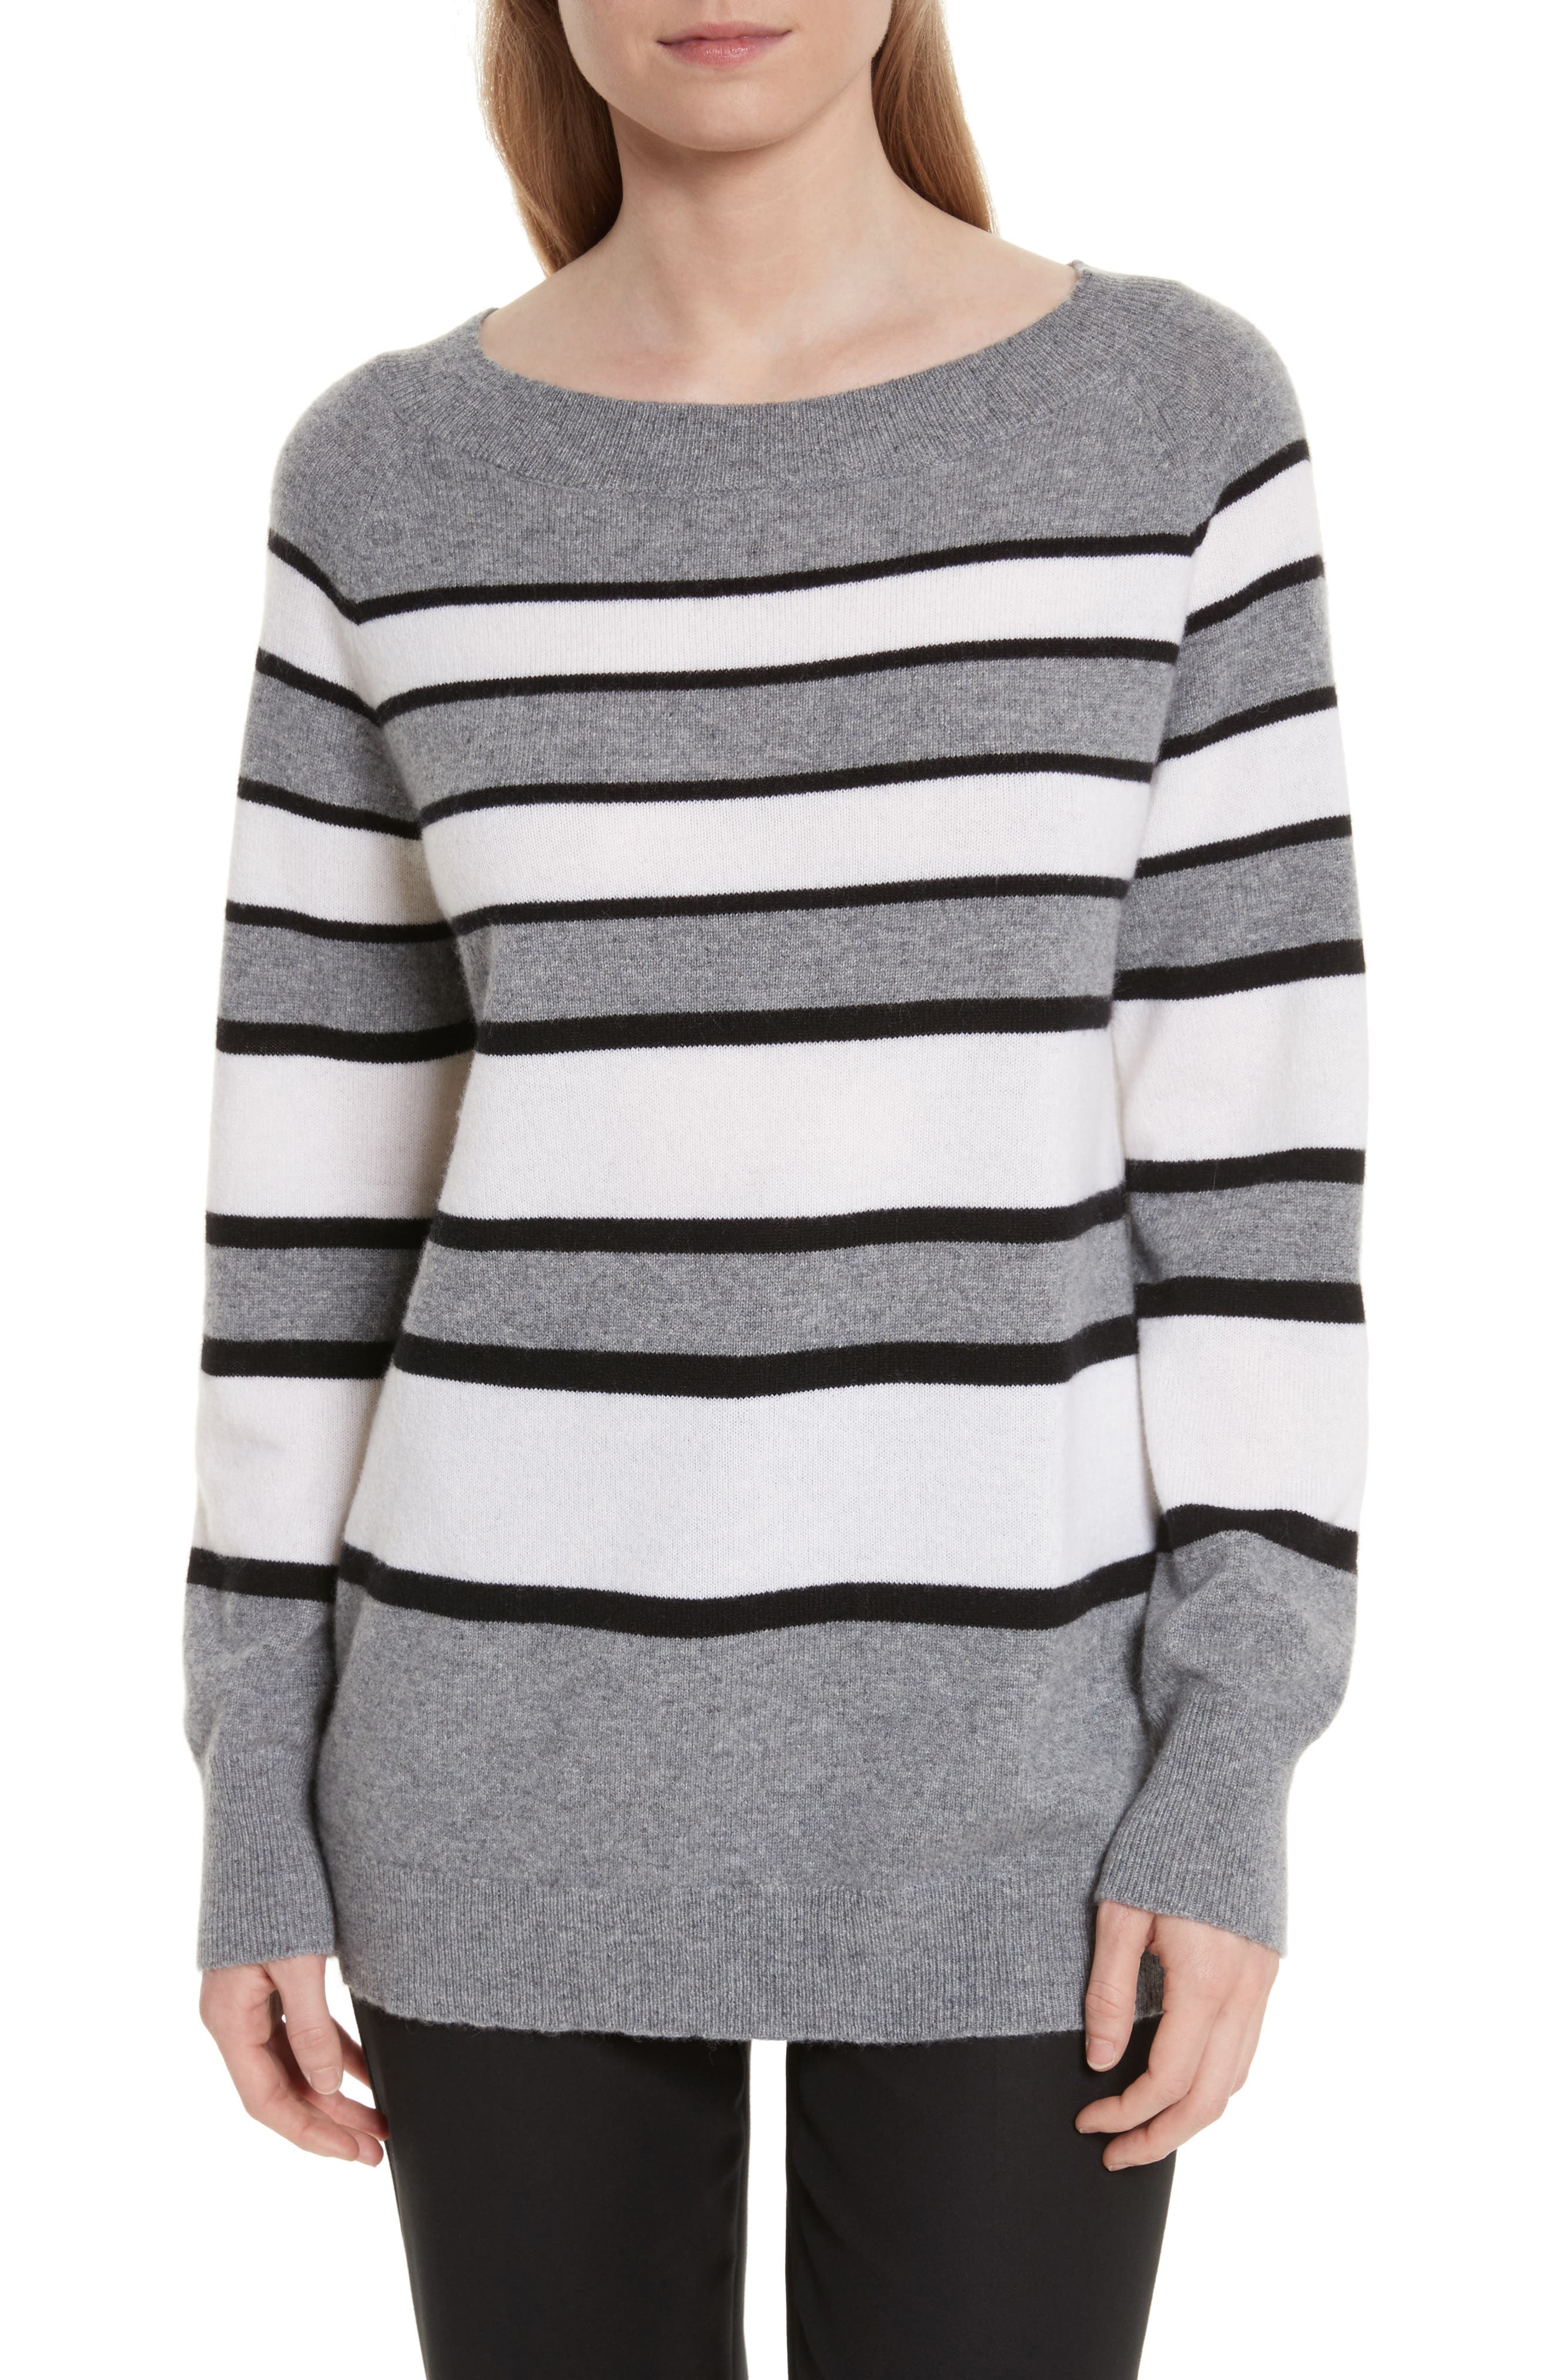 Cody Stripe Cashmere Boat Neck Sweater,                         Main,                         color, Heather Grey Multi